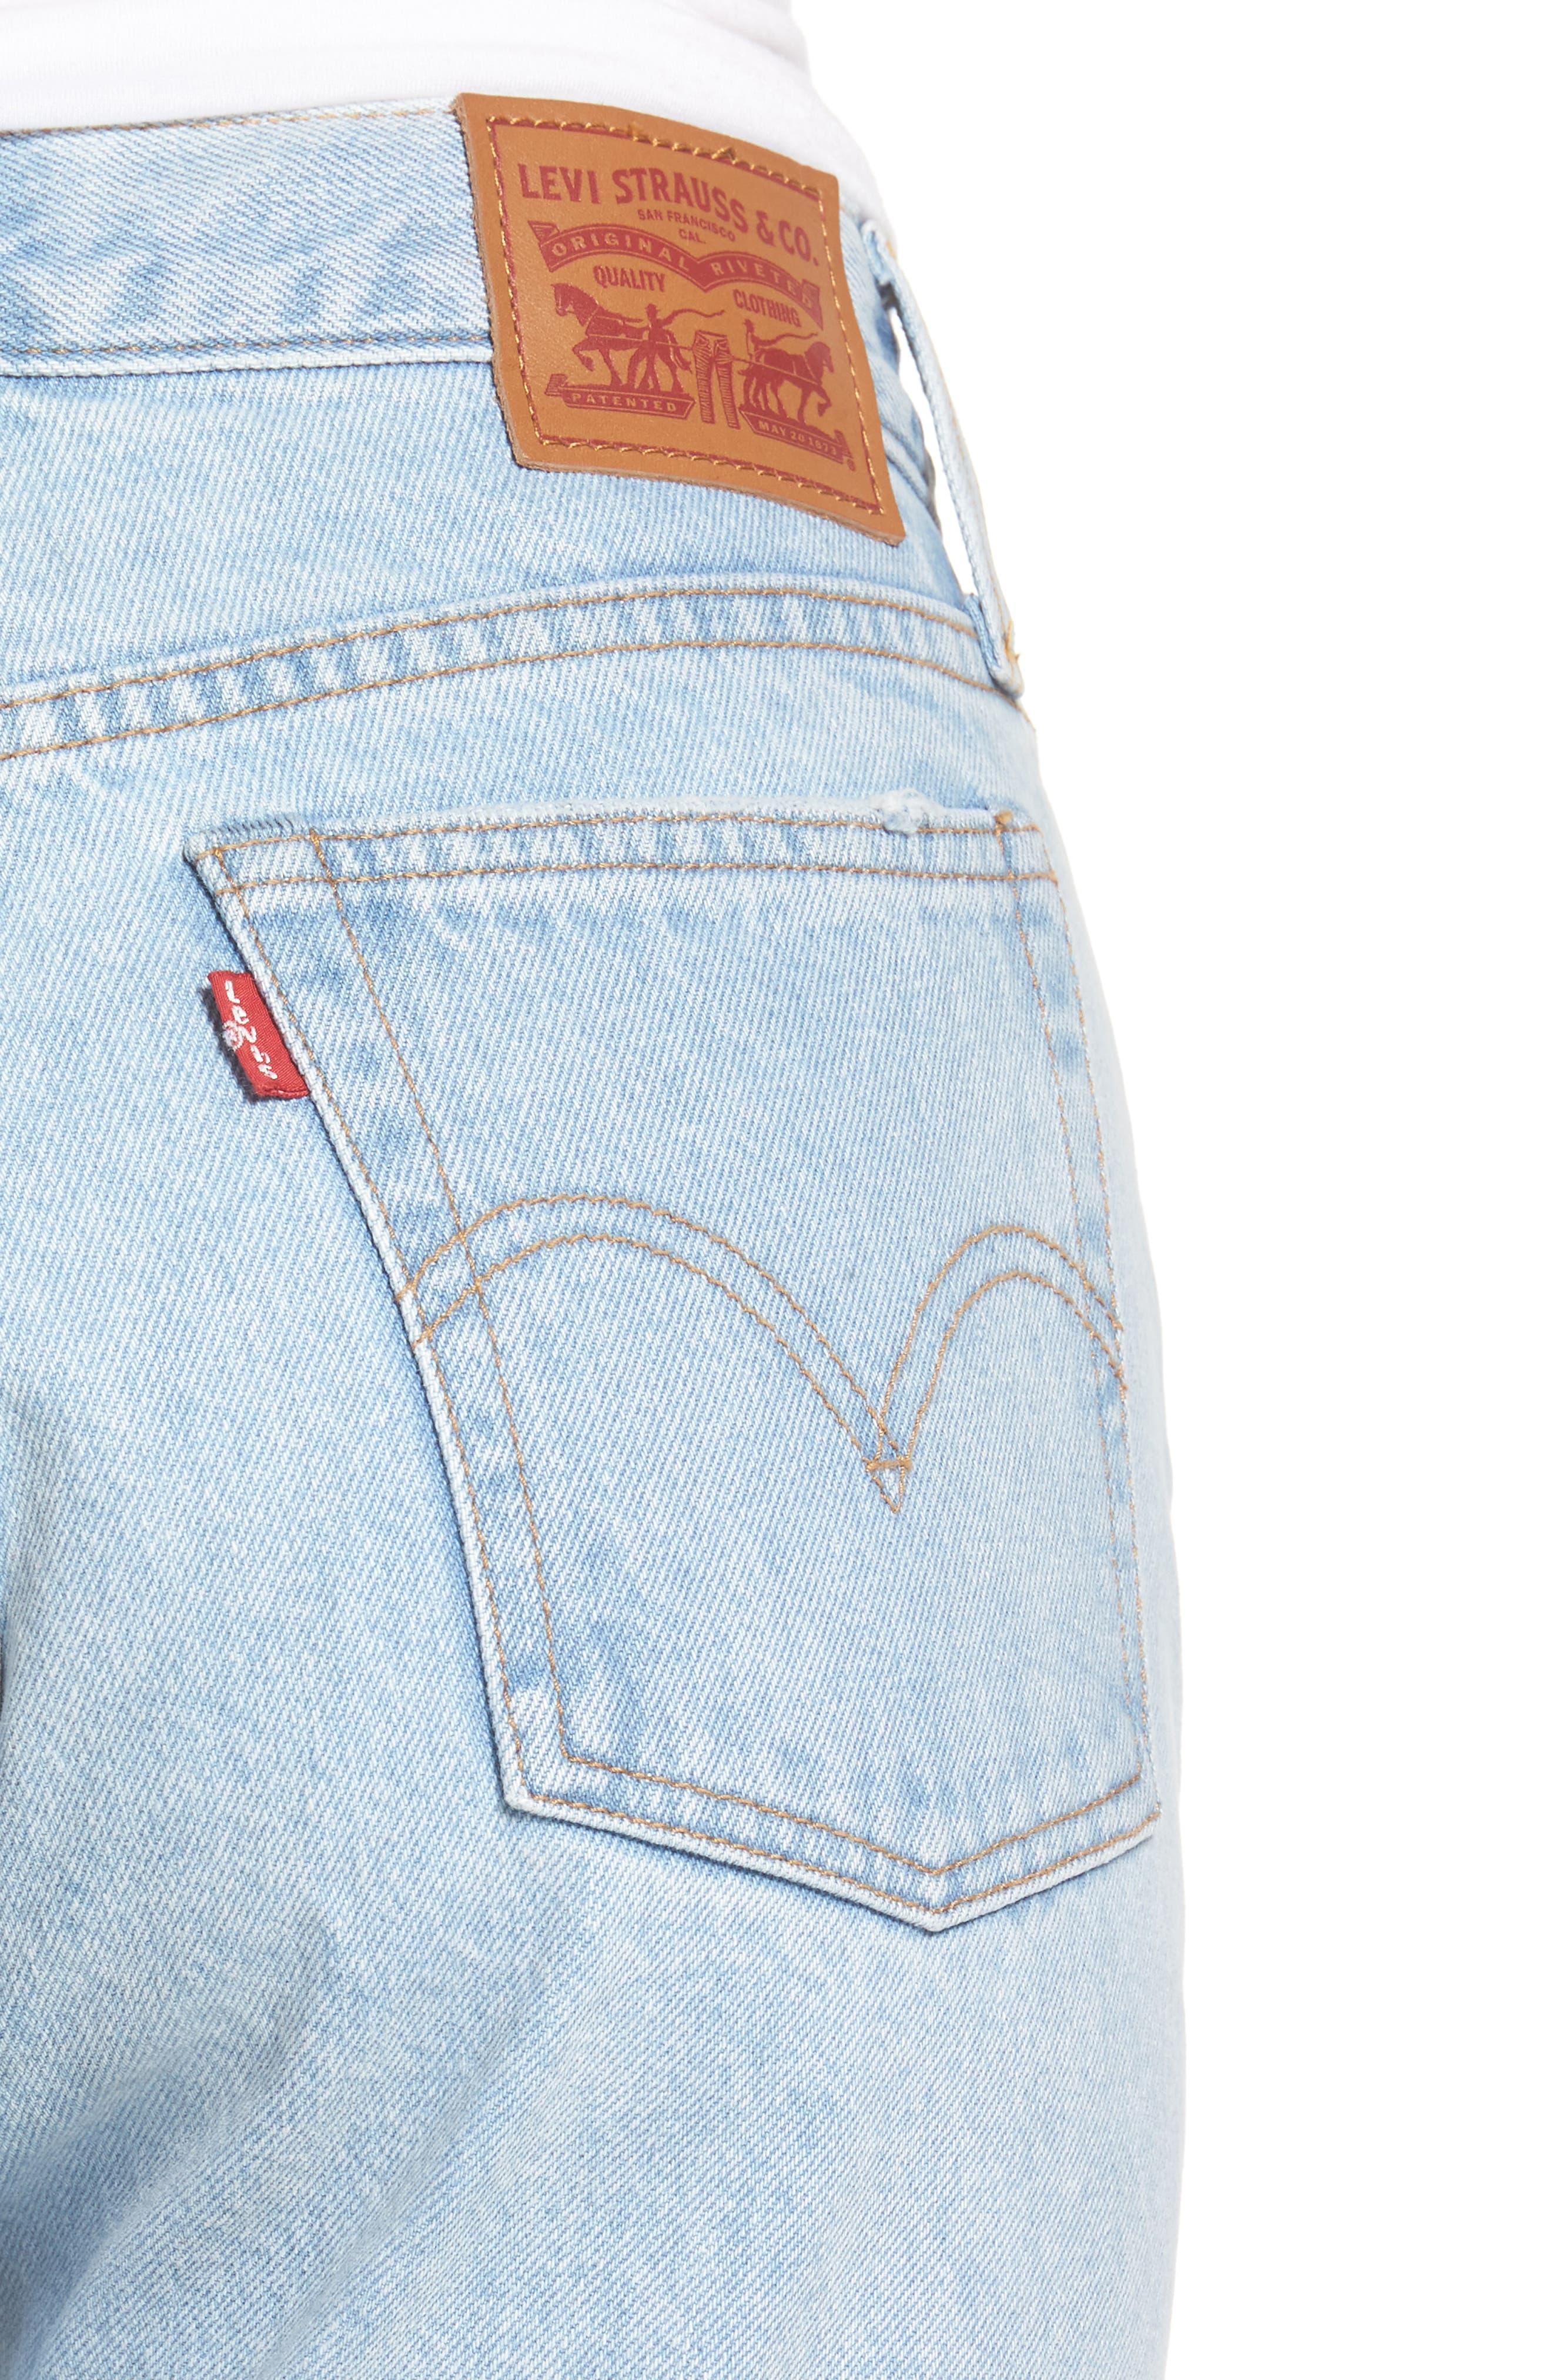 Wedgie High Waist Crop Jeans,                             Alternate thumbnail 4, color,                             450